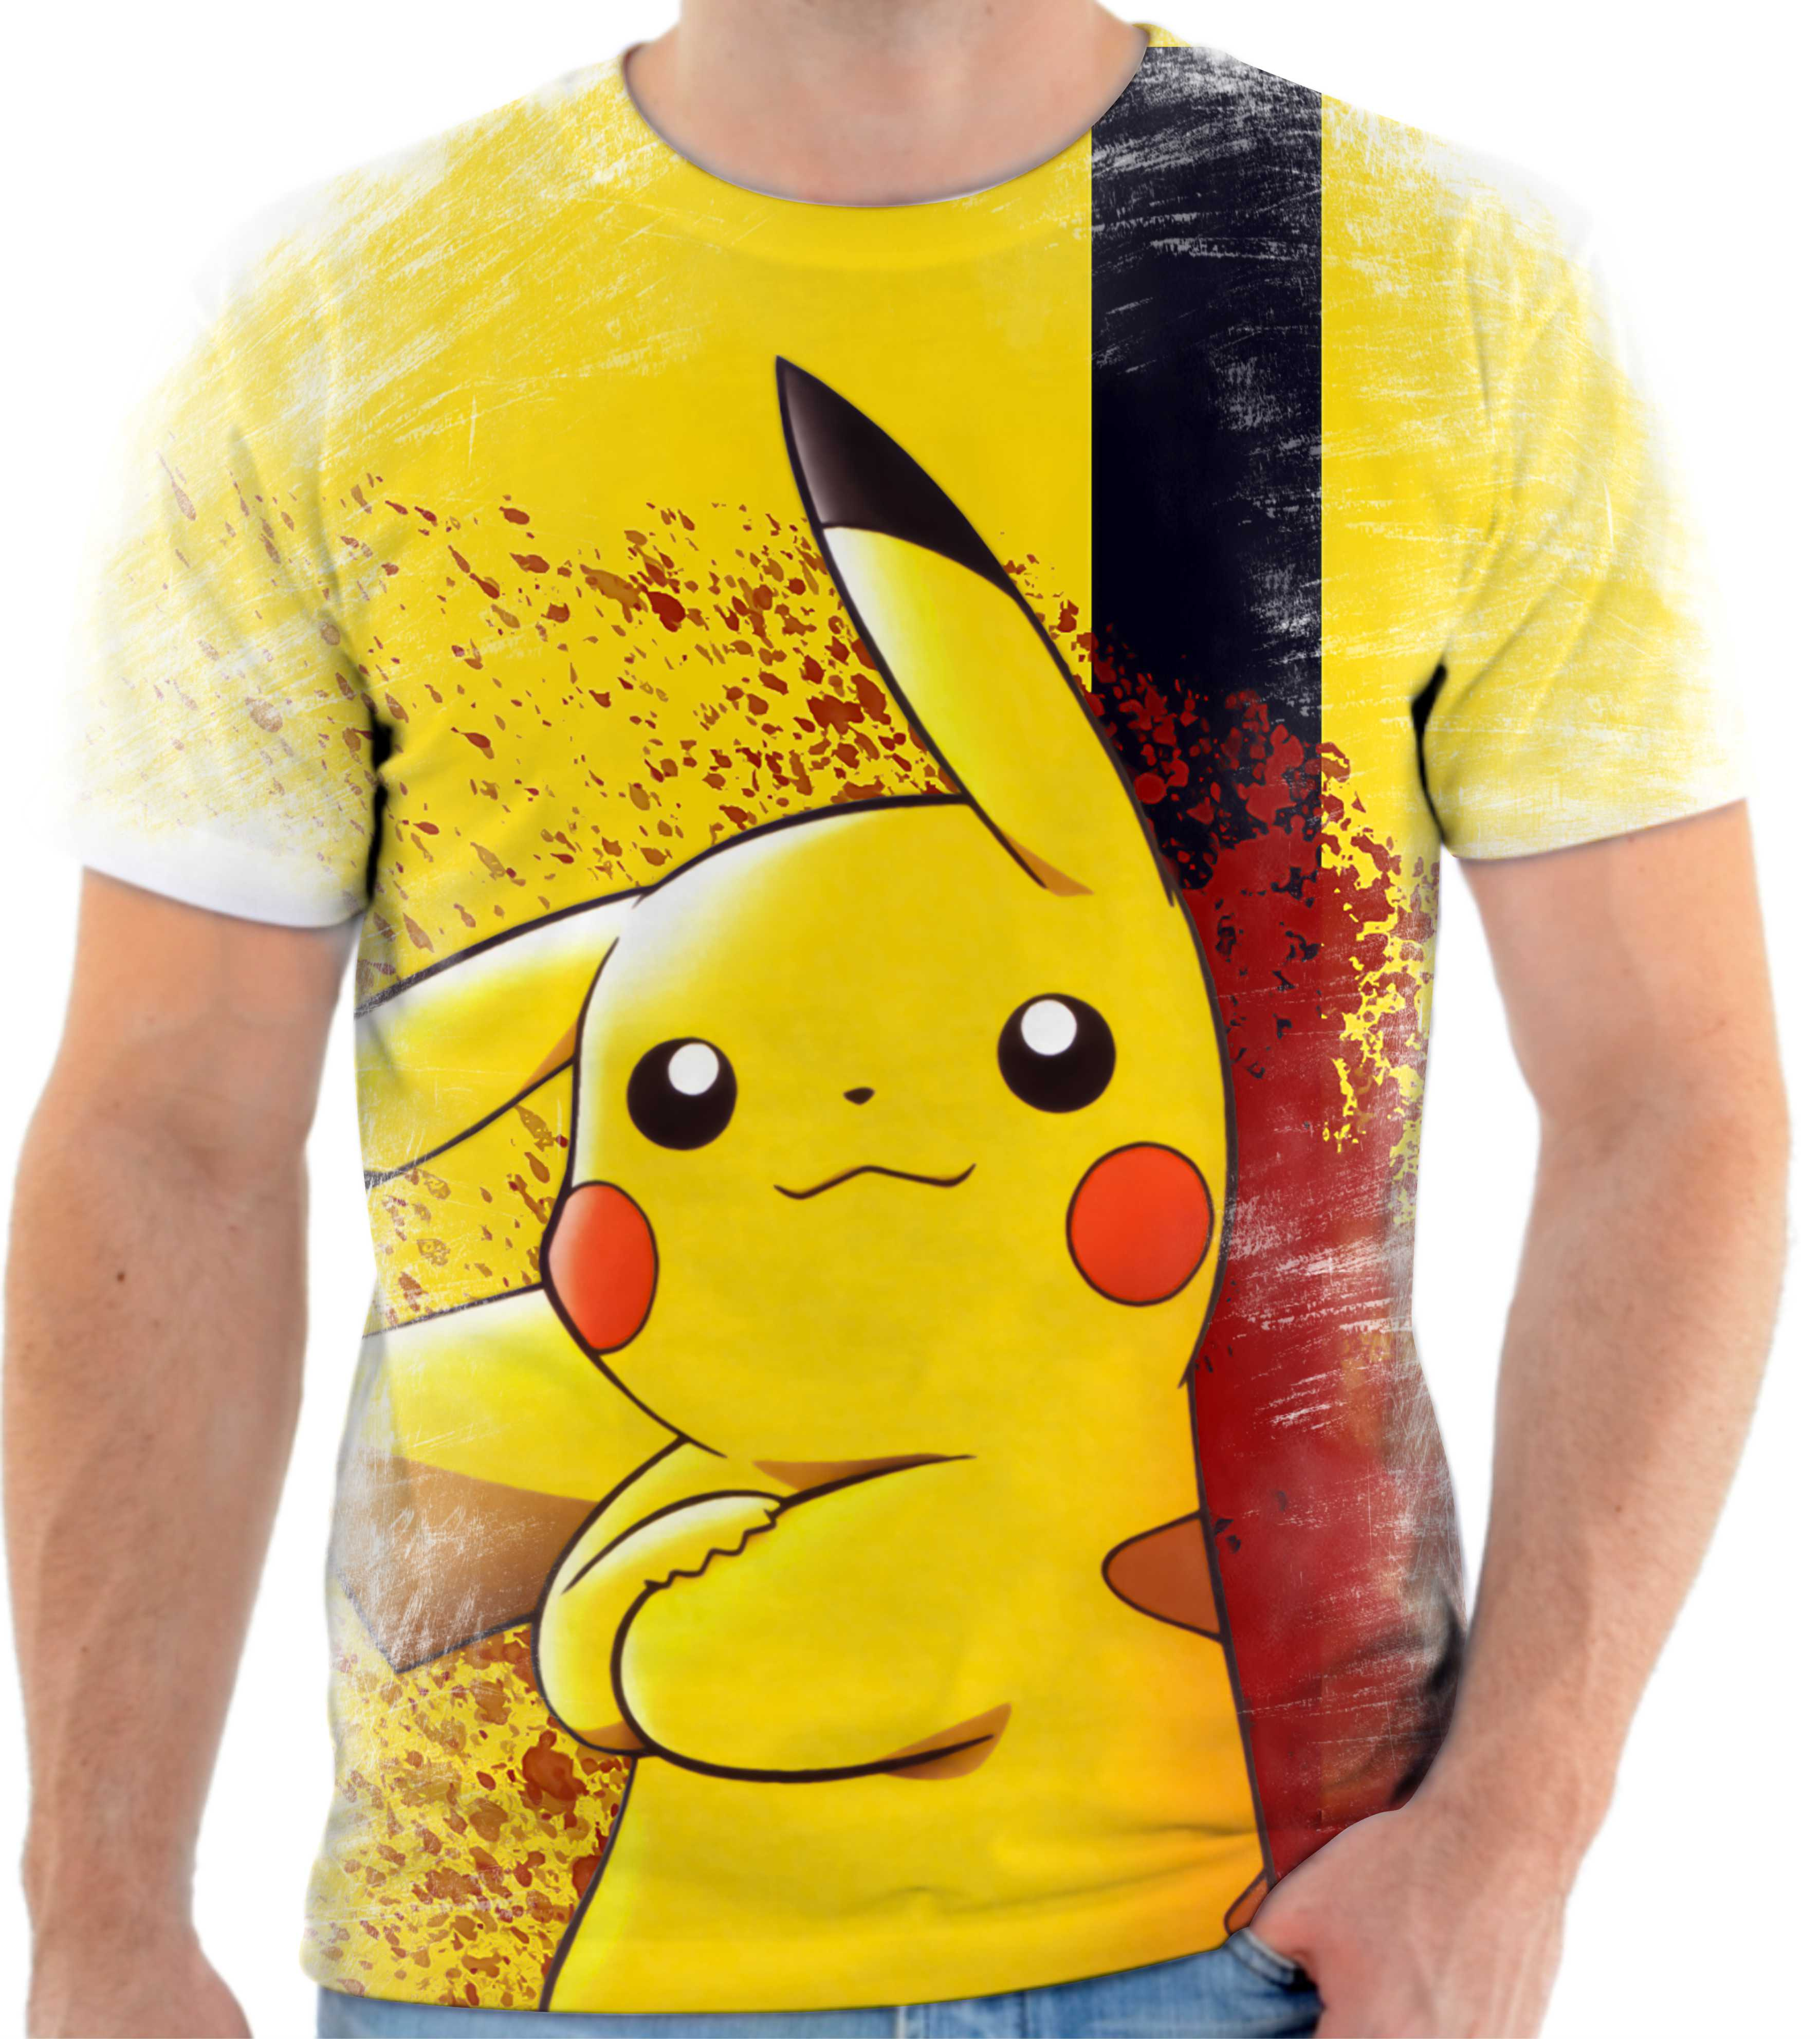 162aa68ea Camisa Camiseta Blusa Personalizada Pokemon Bulbasaur Anime